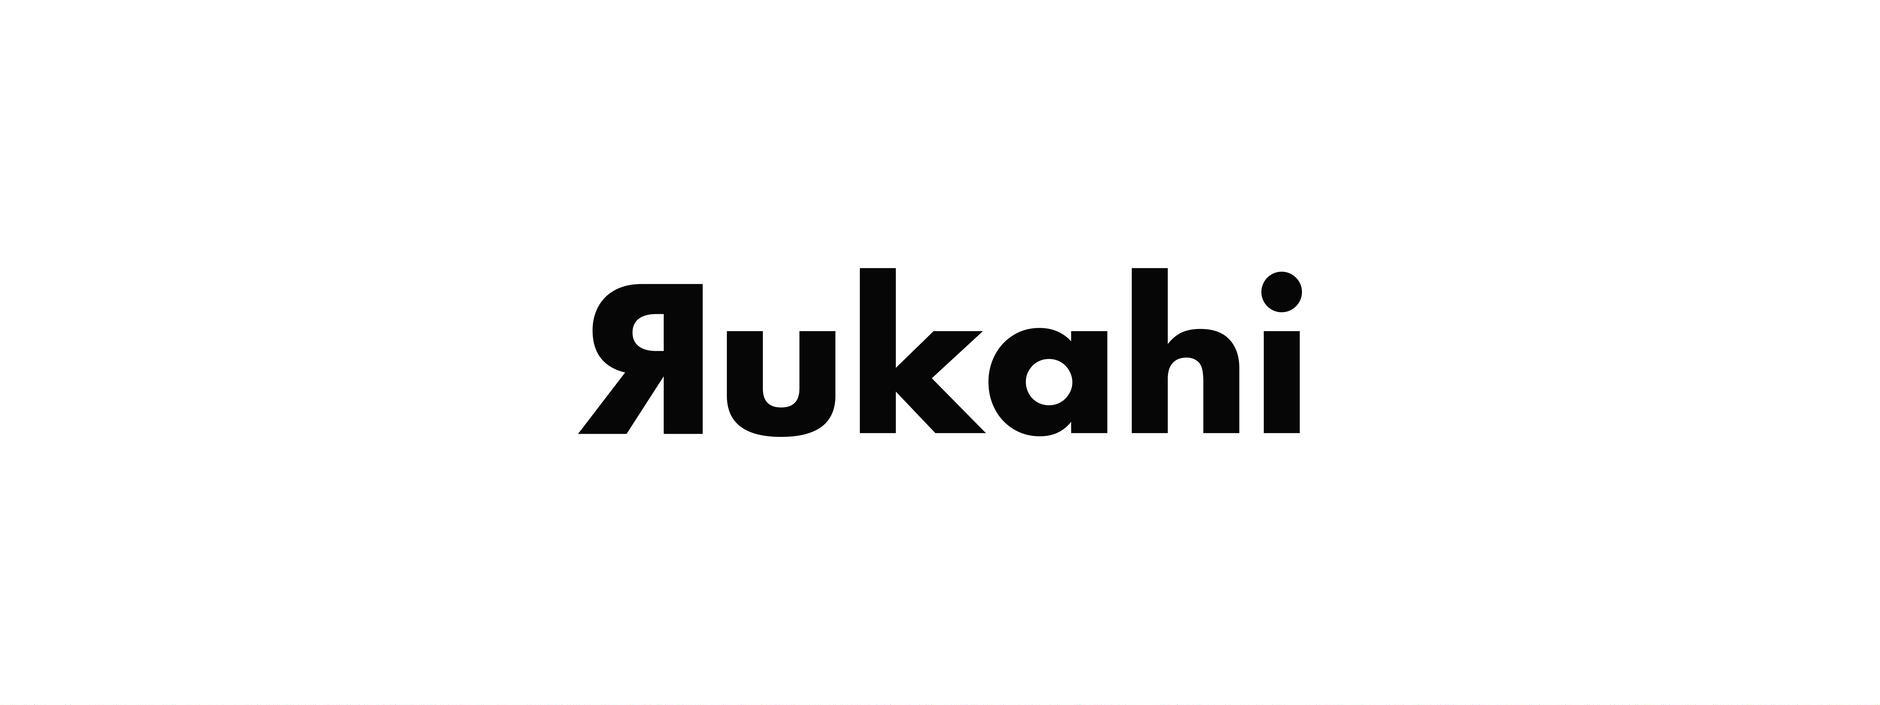 Яukahi